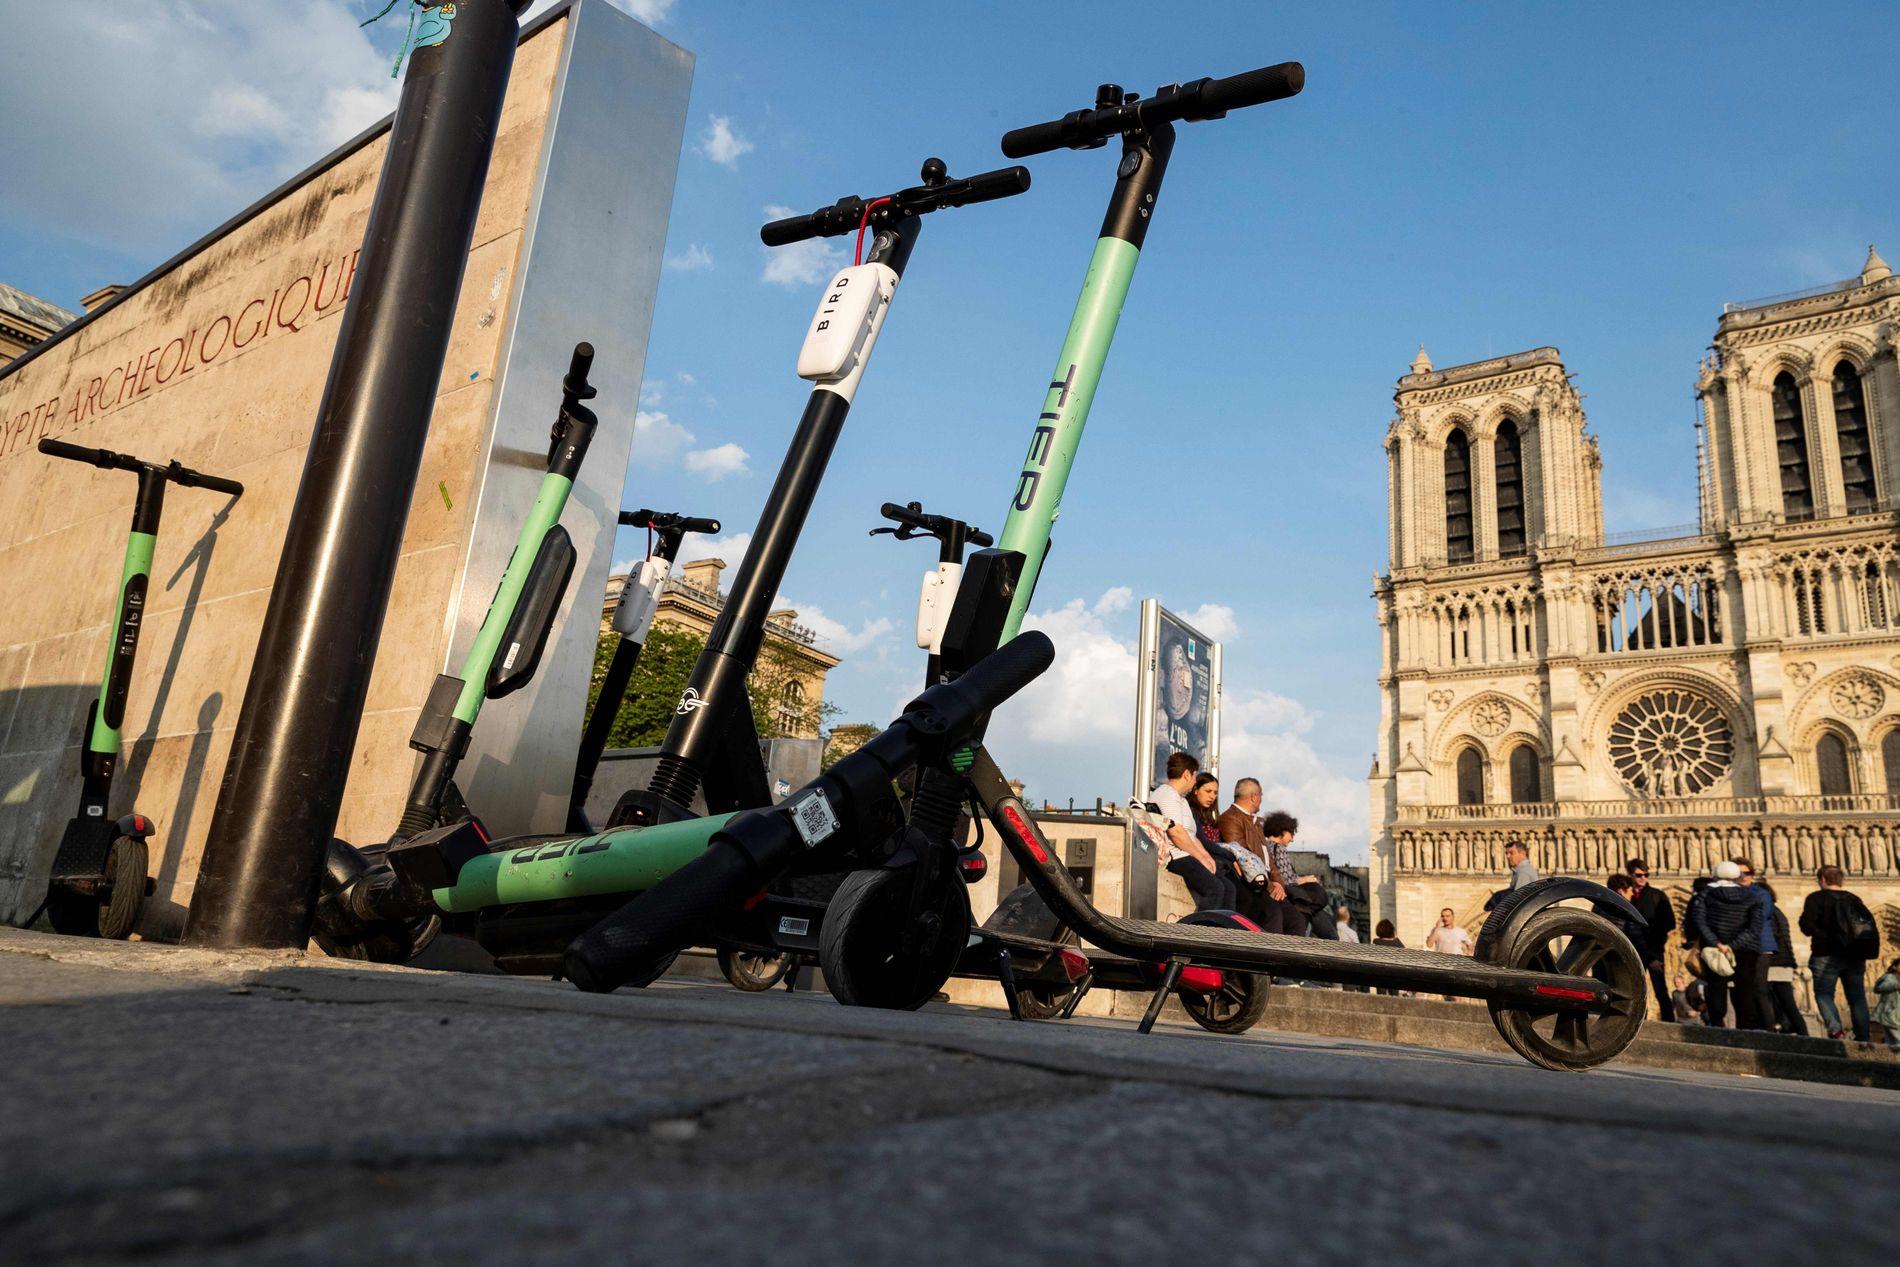 POPULÆRT: Mange europeiske byer har de populære sparkesyklene. Her fra Paris tidligere i år.